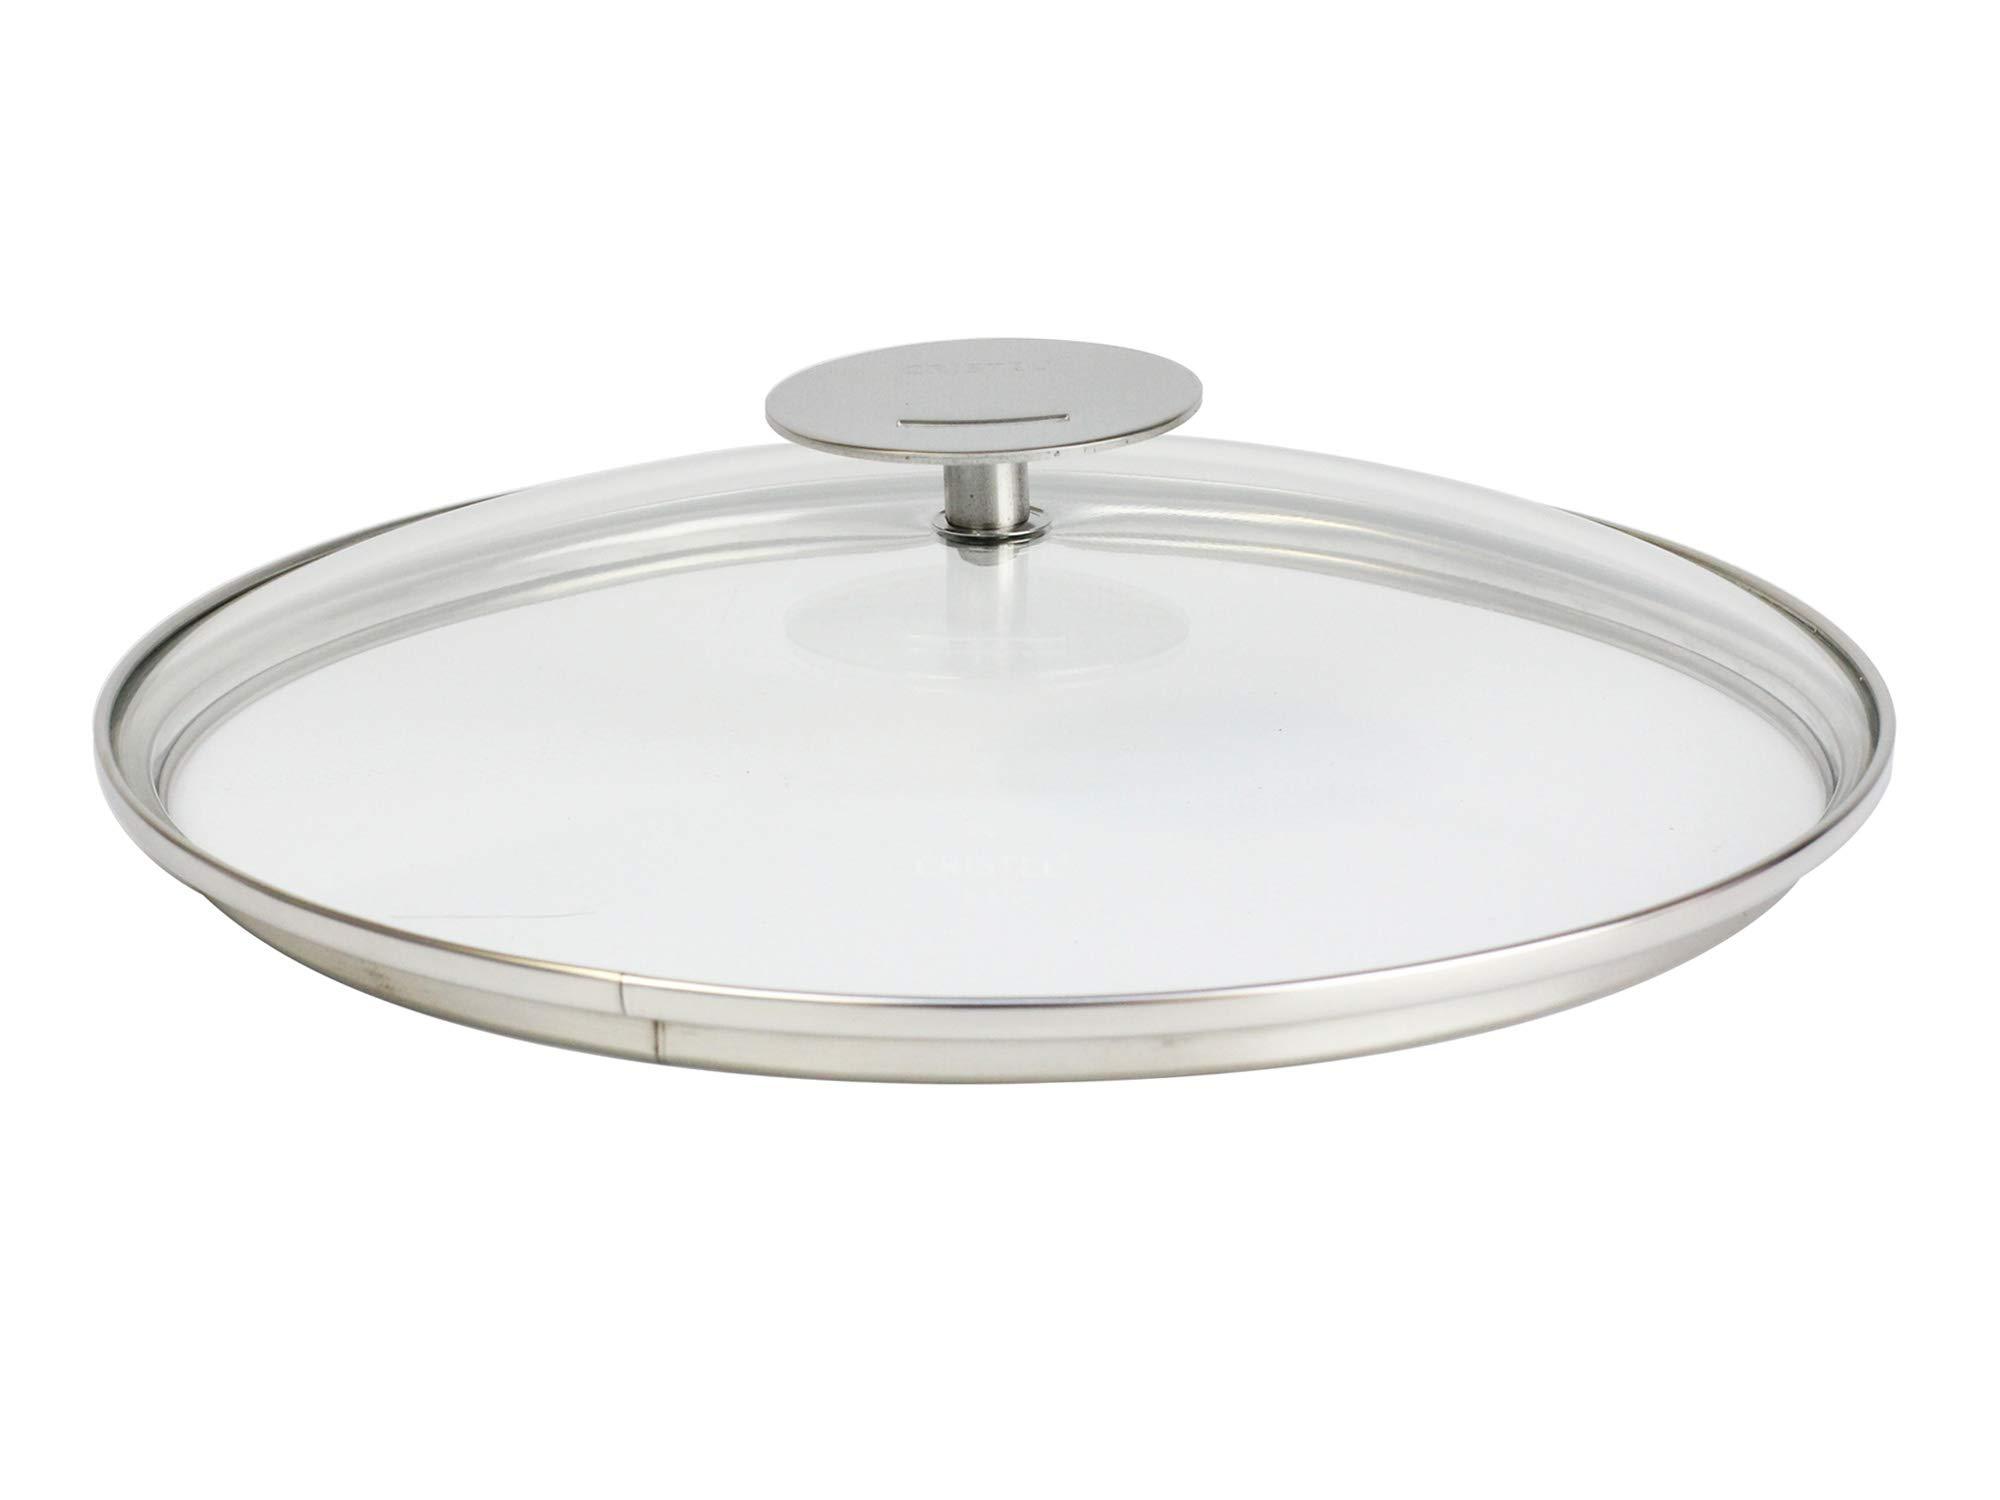 Cristel K28P Domed Glass Lid, 11'', Silver